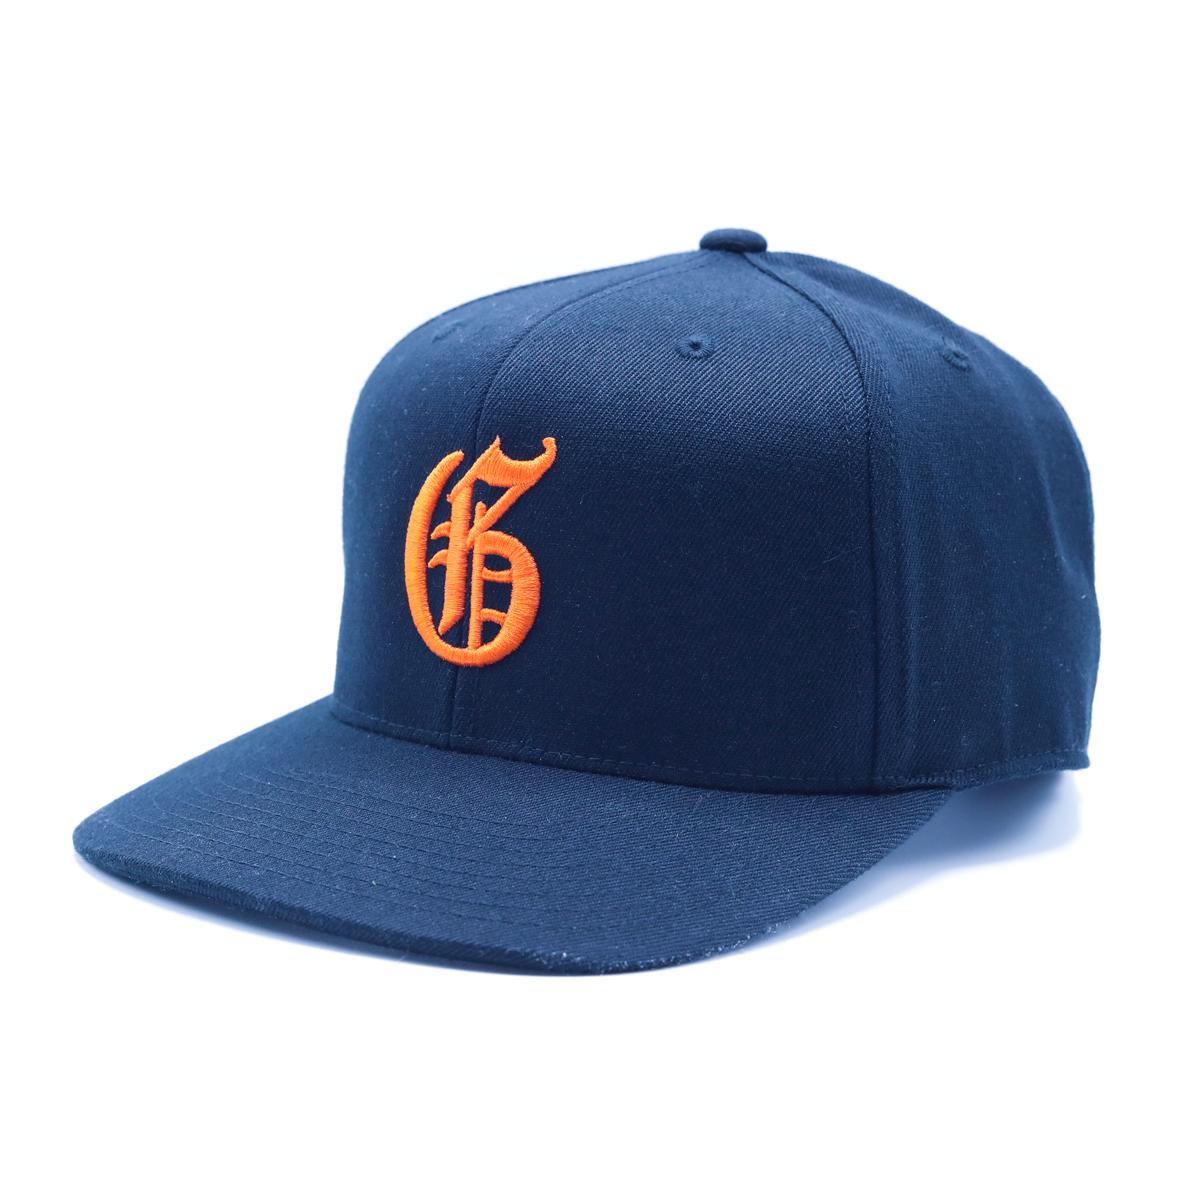 Detroit G Snapback Tanager One Size In 2021 Snapback Wide Brim Hat Blue Hat